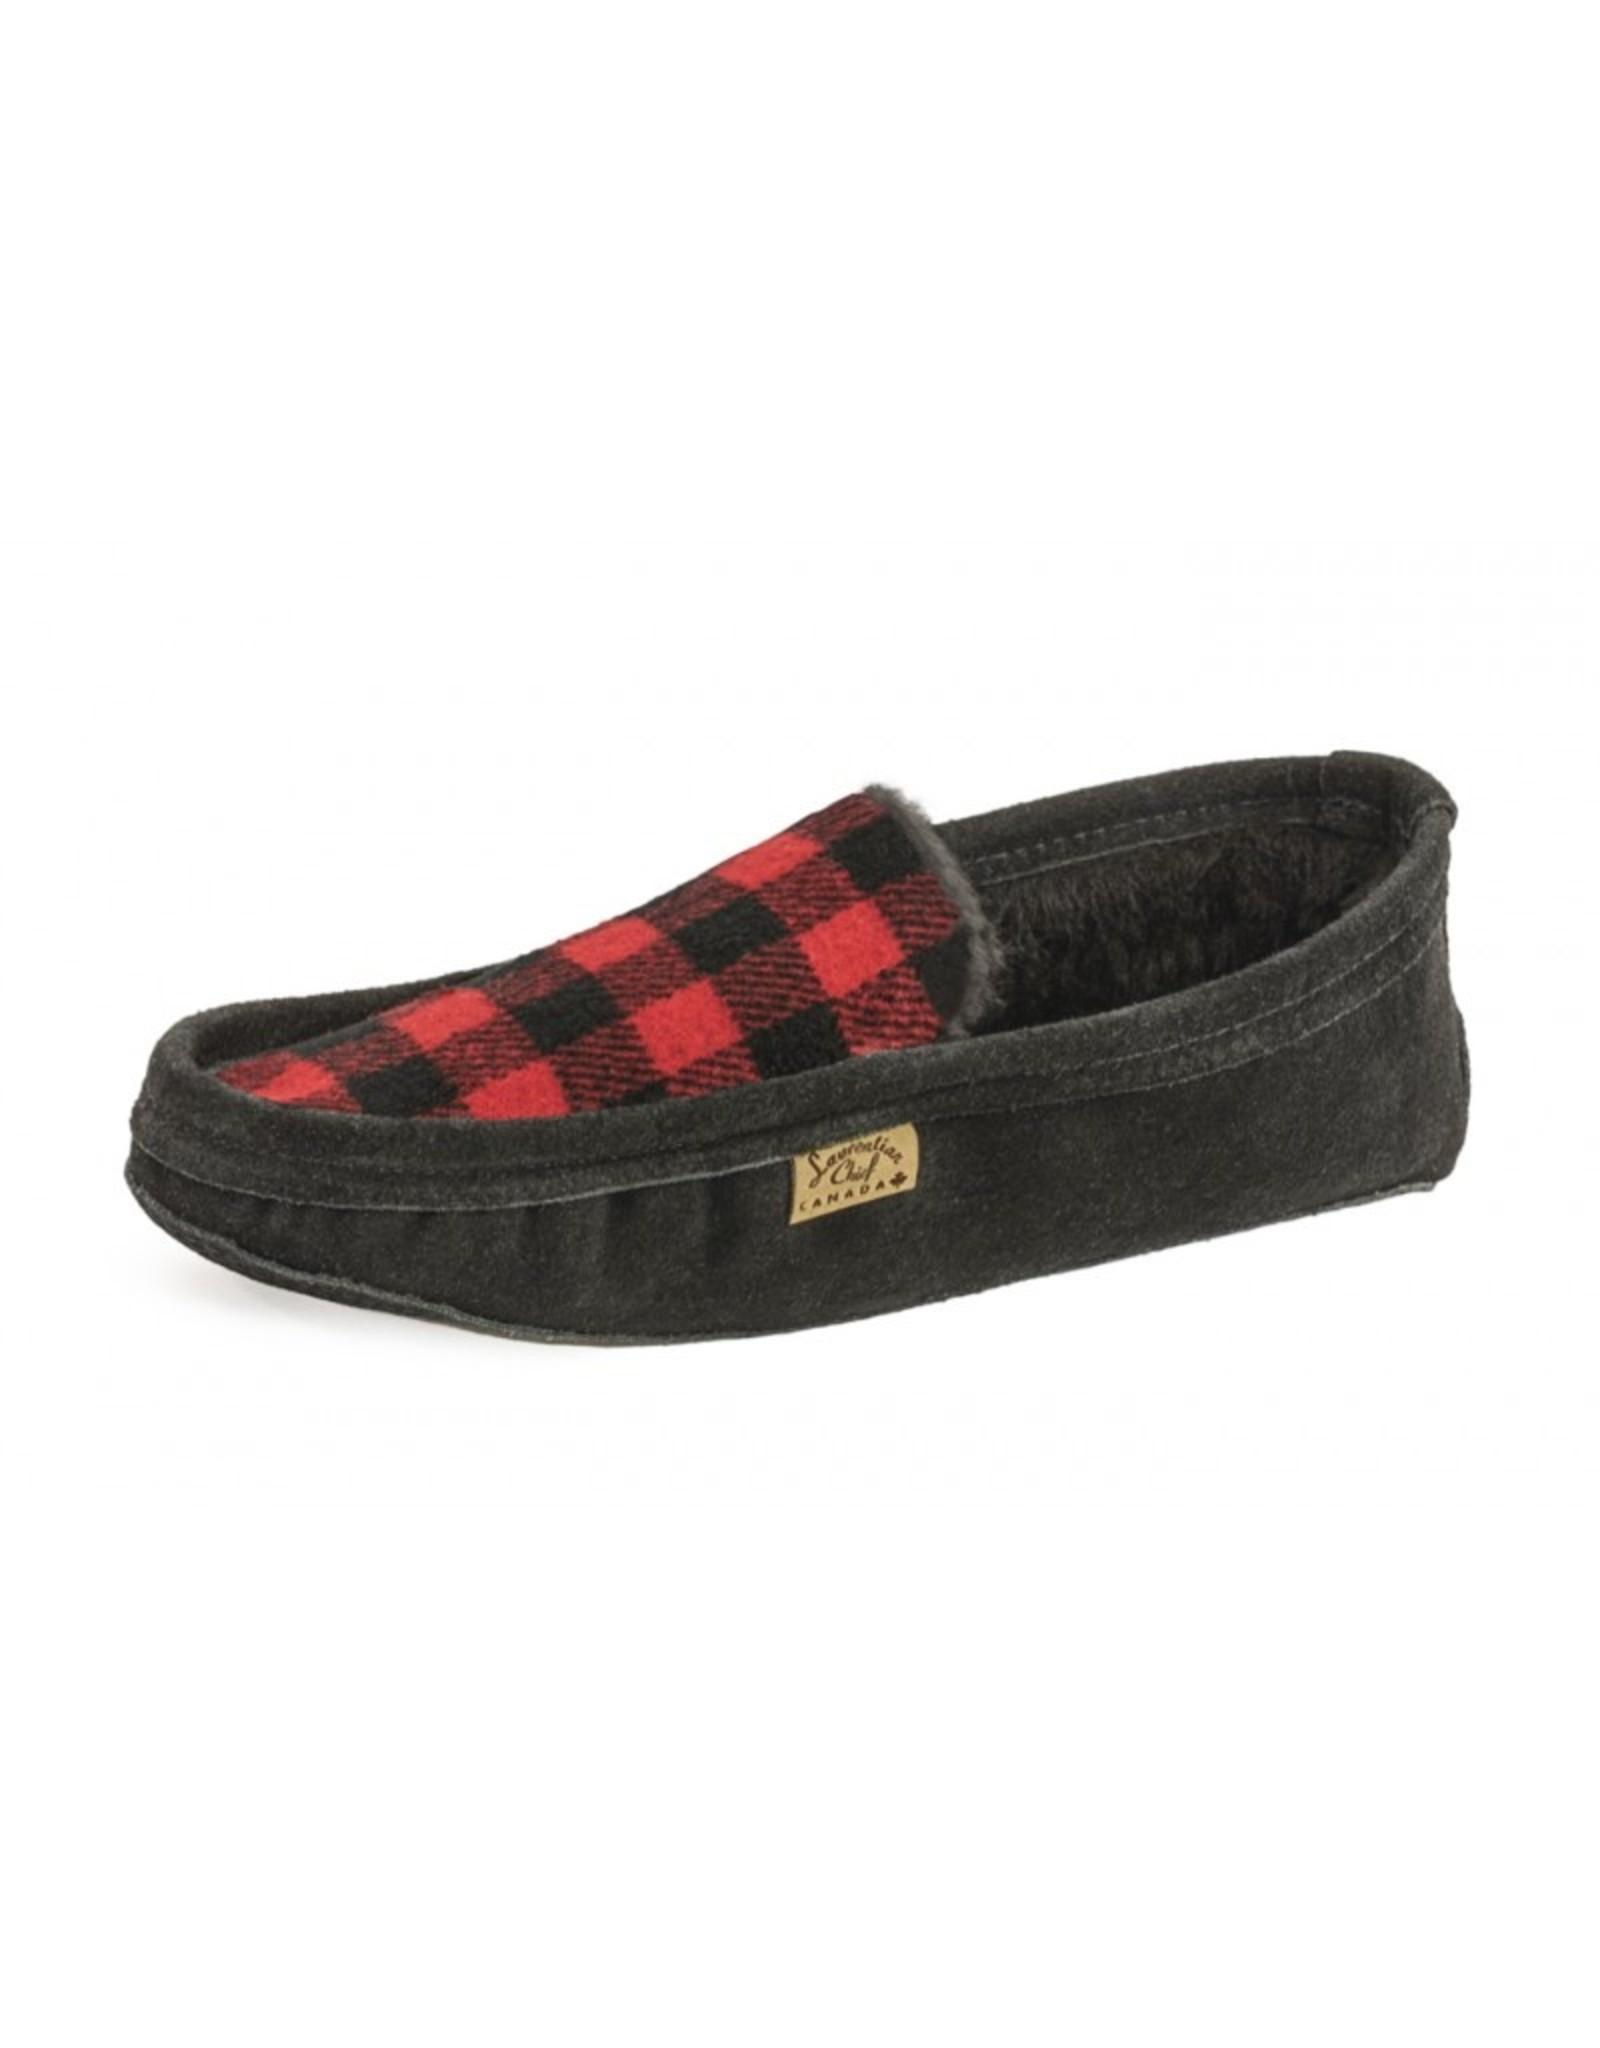 Mens Black & Red lined Flannel Slipper - 60637BLRM